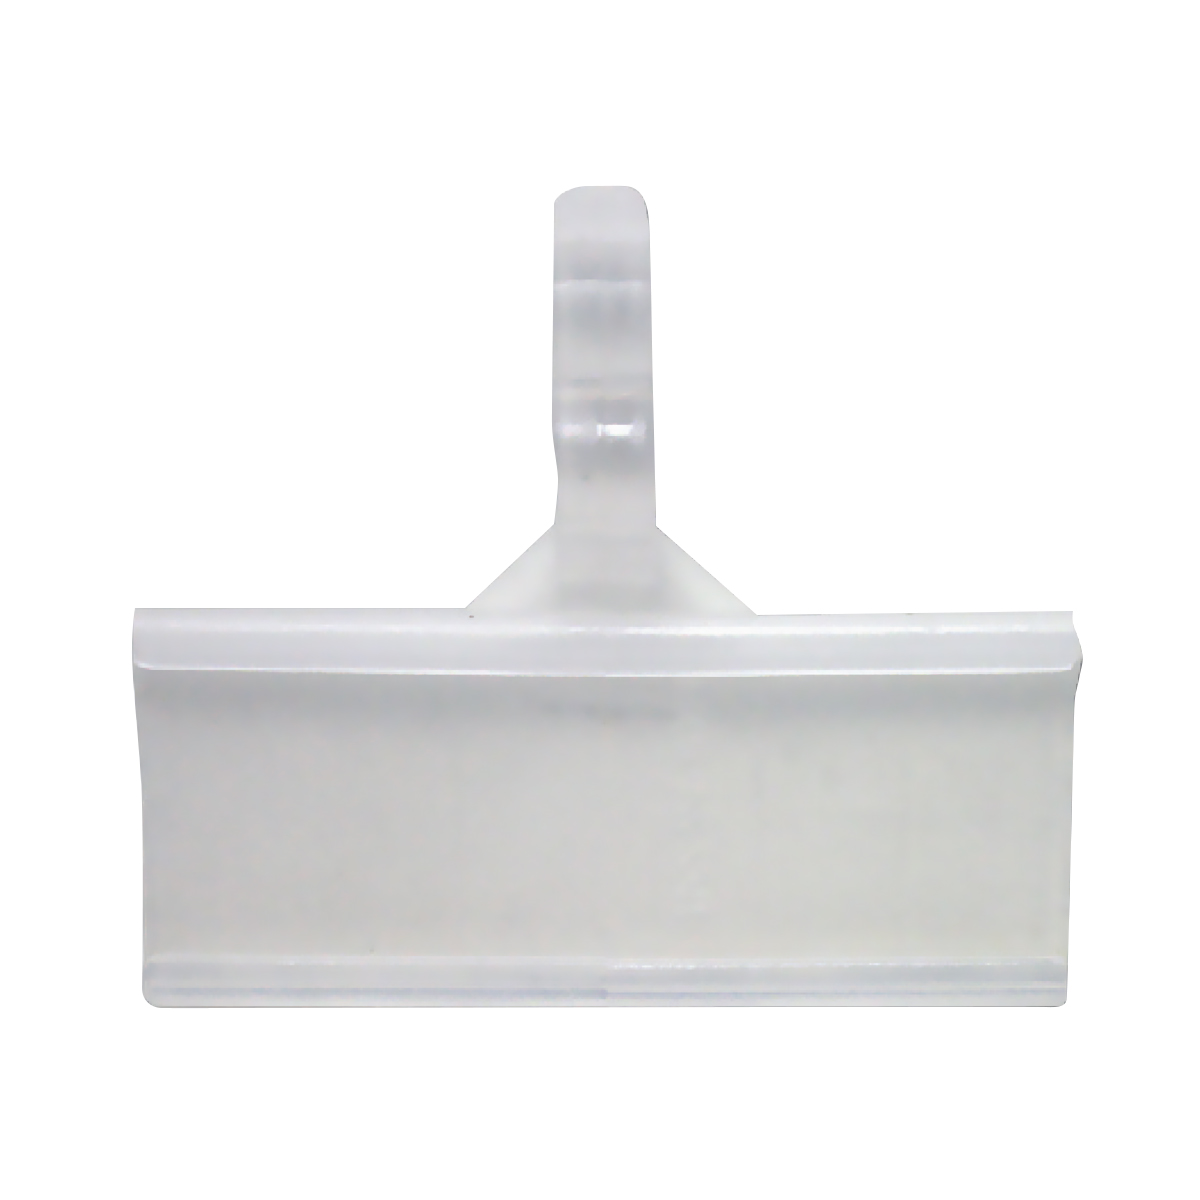 Clear plastic front window label holder designed for Metal Wire Basket